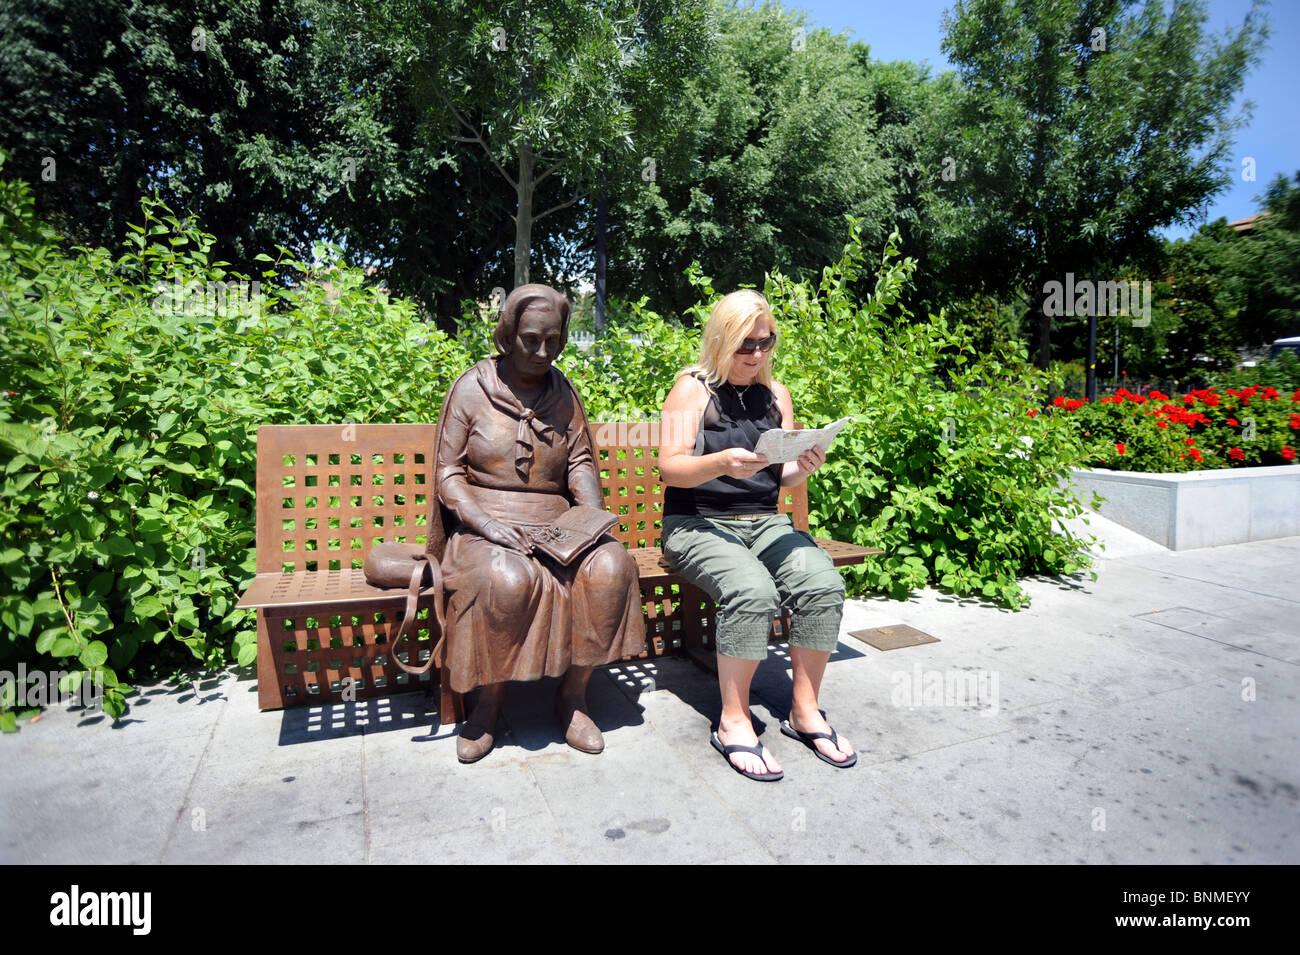 A tourist sits next to a sculpture of Elena Martin Vivaldi  by Jose A. Castro Vilchez on the Avda de le Constitucion - Stock Image